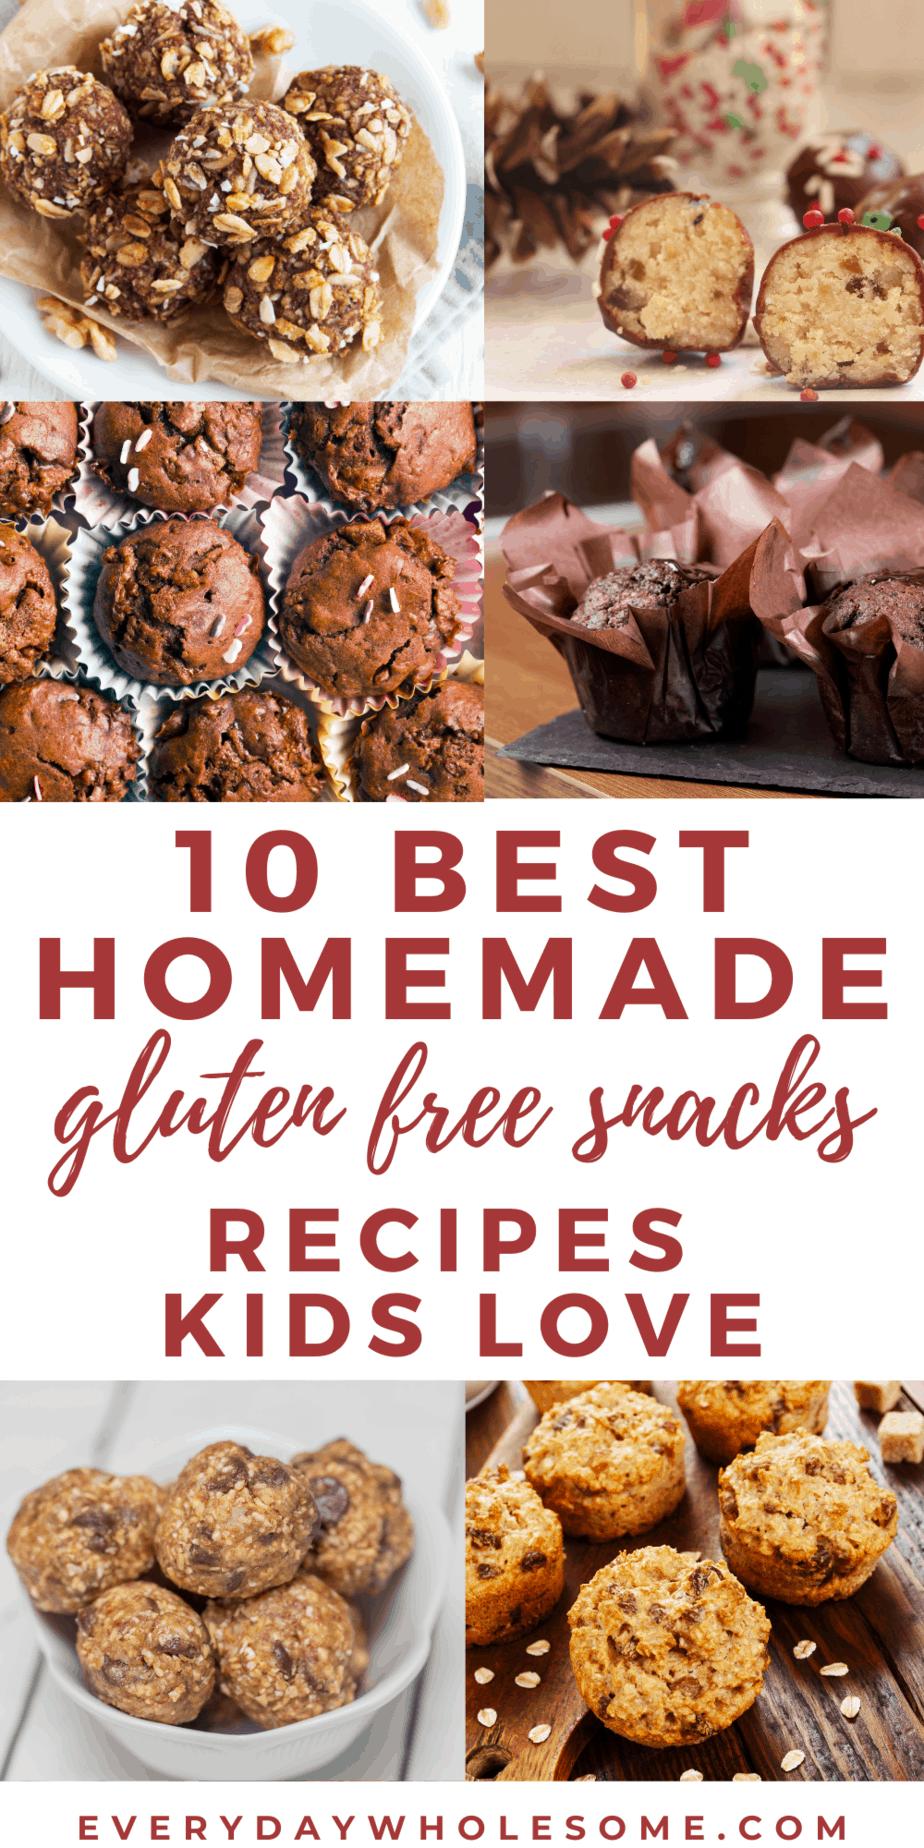 10 best homemade gluten free snack recipes kids love pin